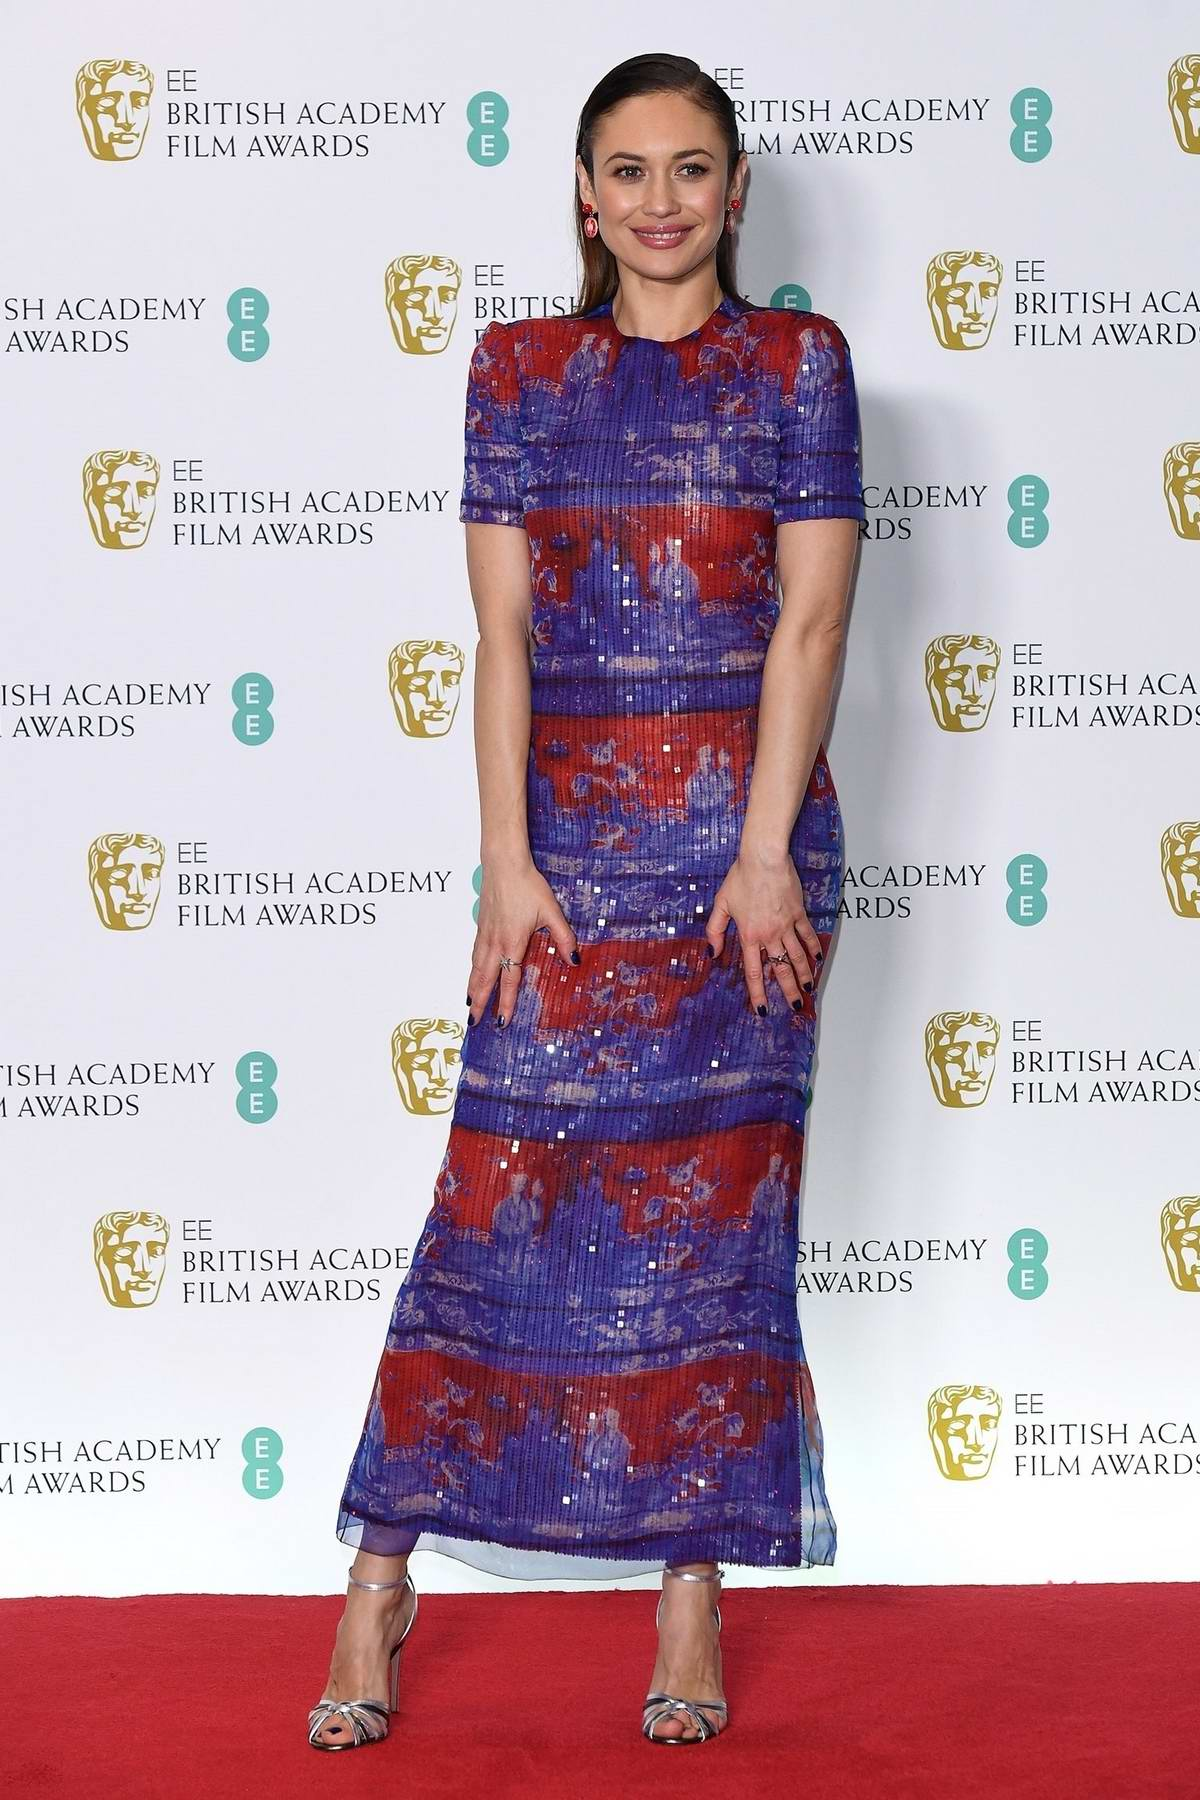 Olga Kurylenko attends the 72nd EE British Academy Film Awards (BAFTA 2019) at Royal Albert Hall in London, UK